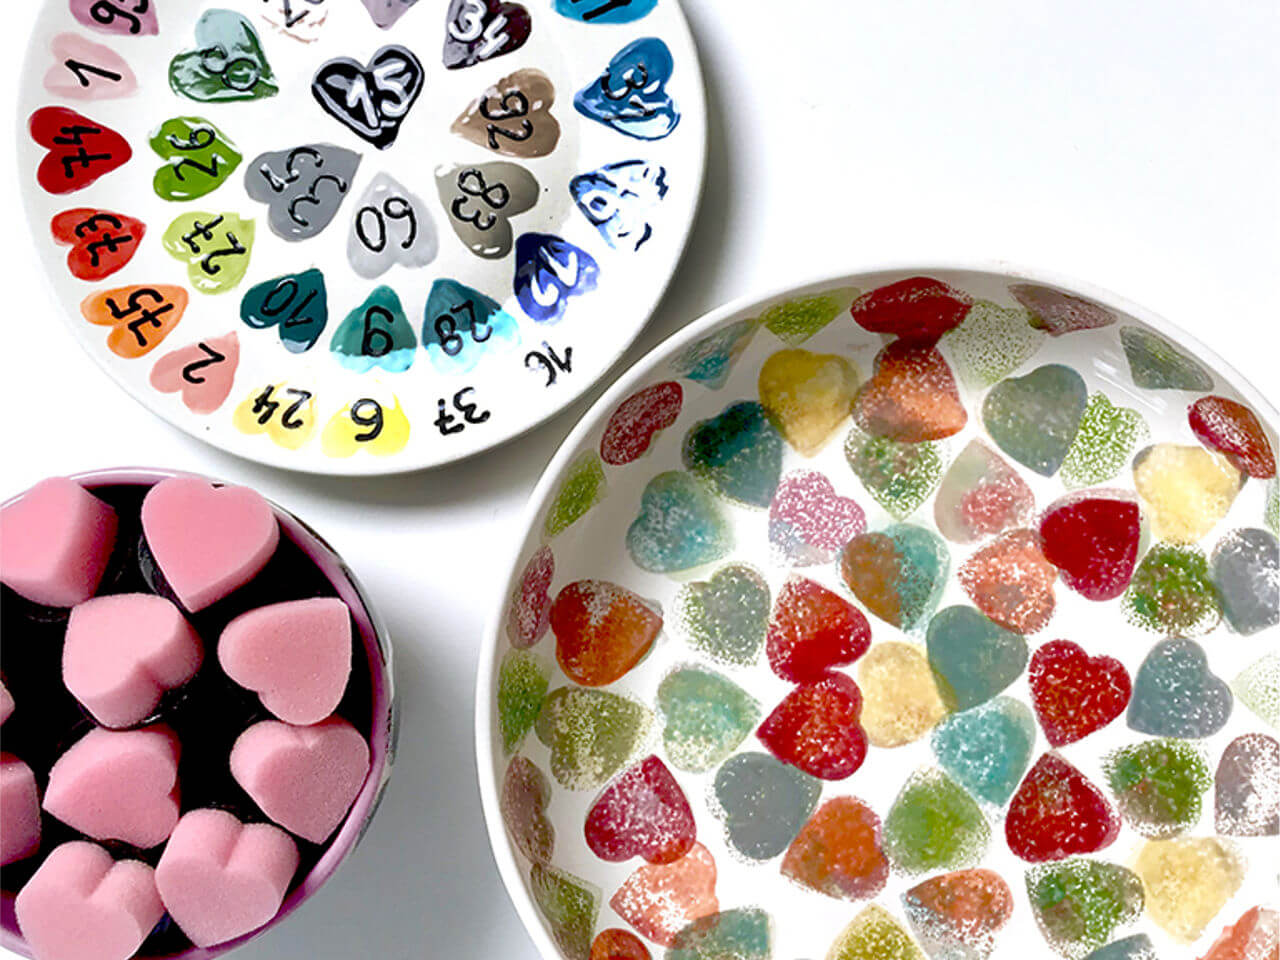 Keramik bemalen Neuss Potteria - Keramik selbst bemalen